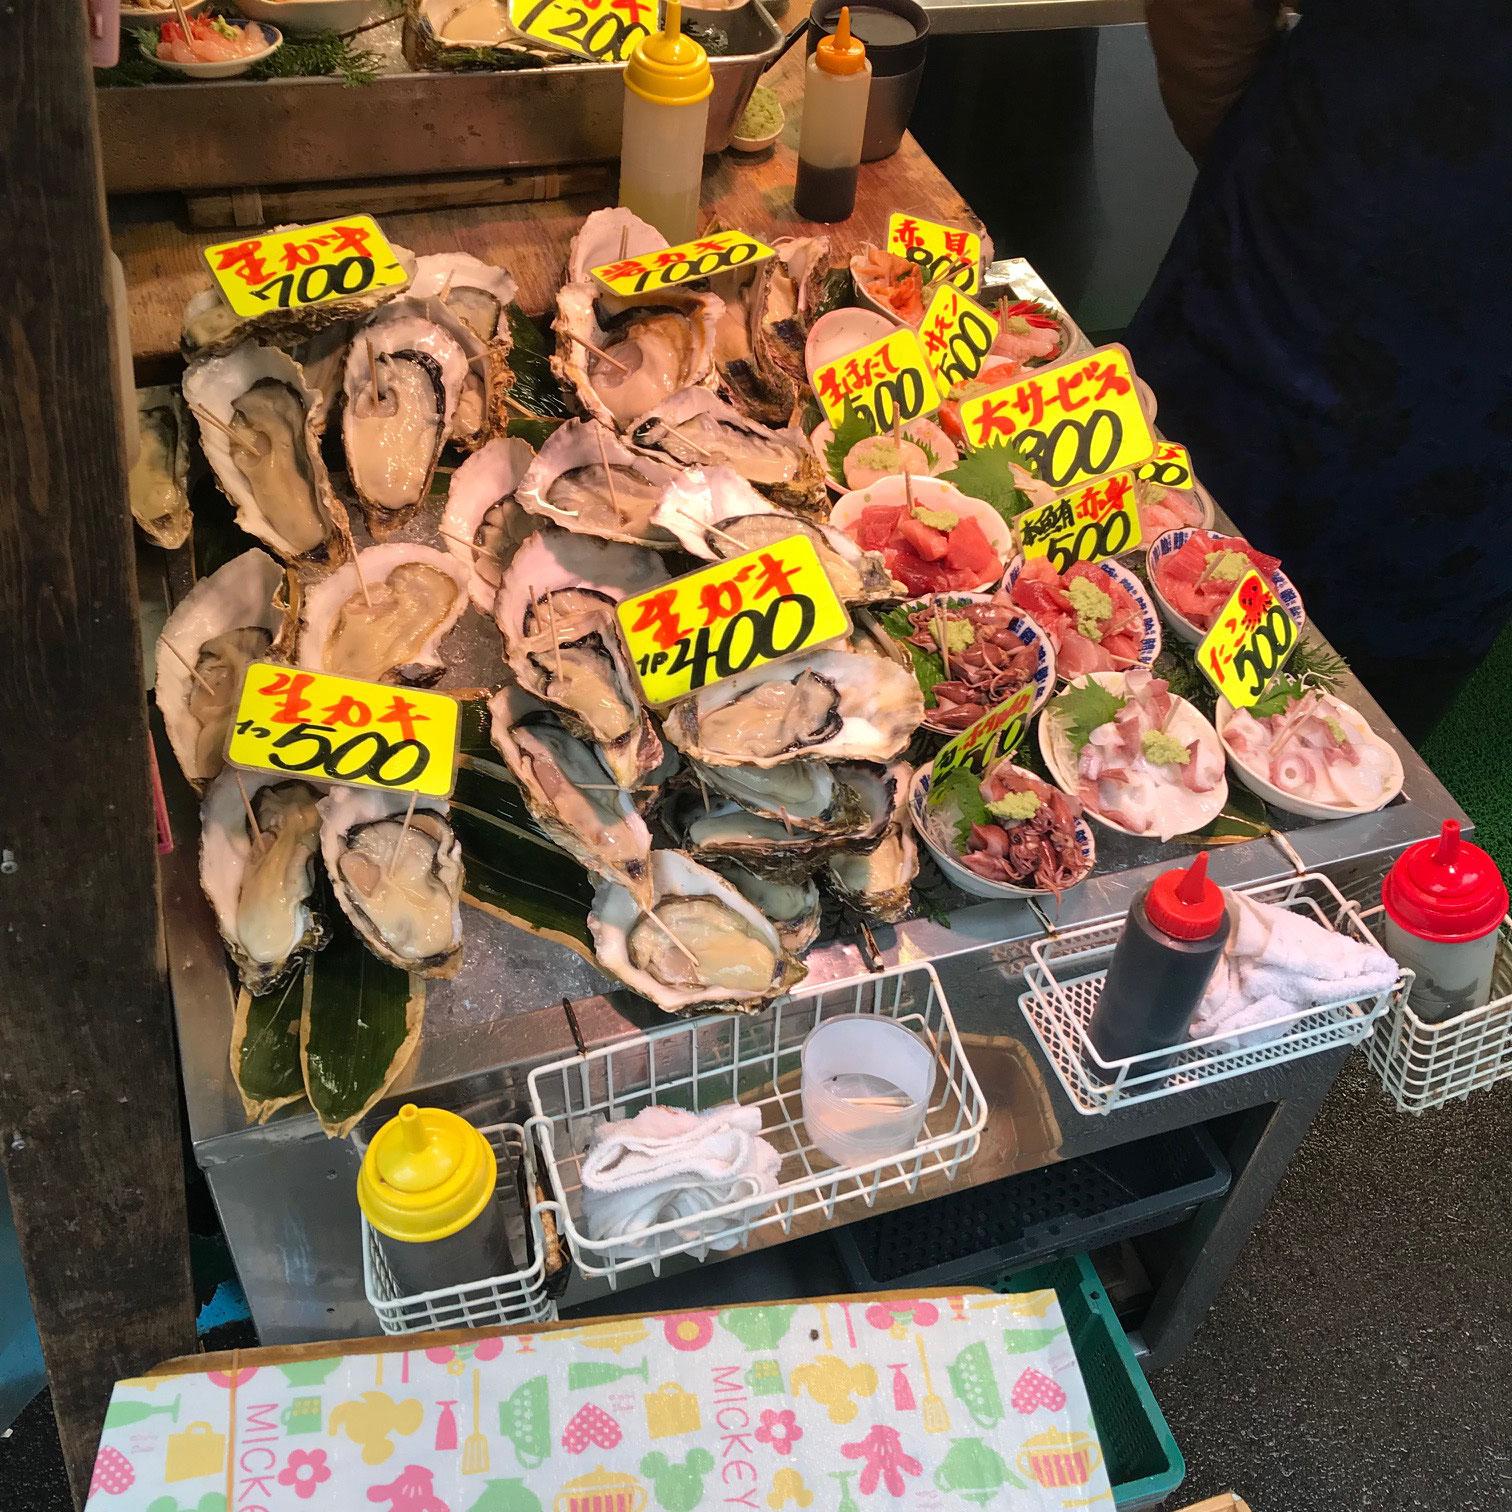 Muscheln über Muscheln